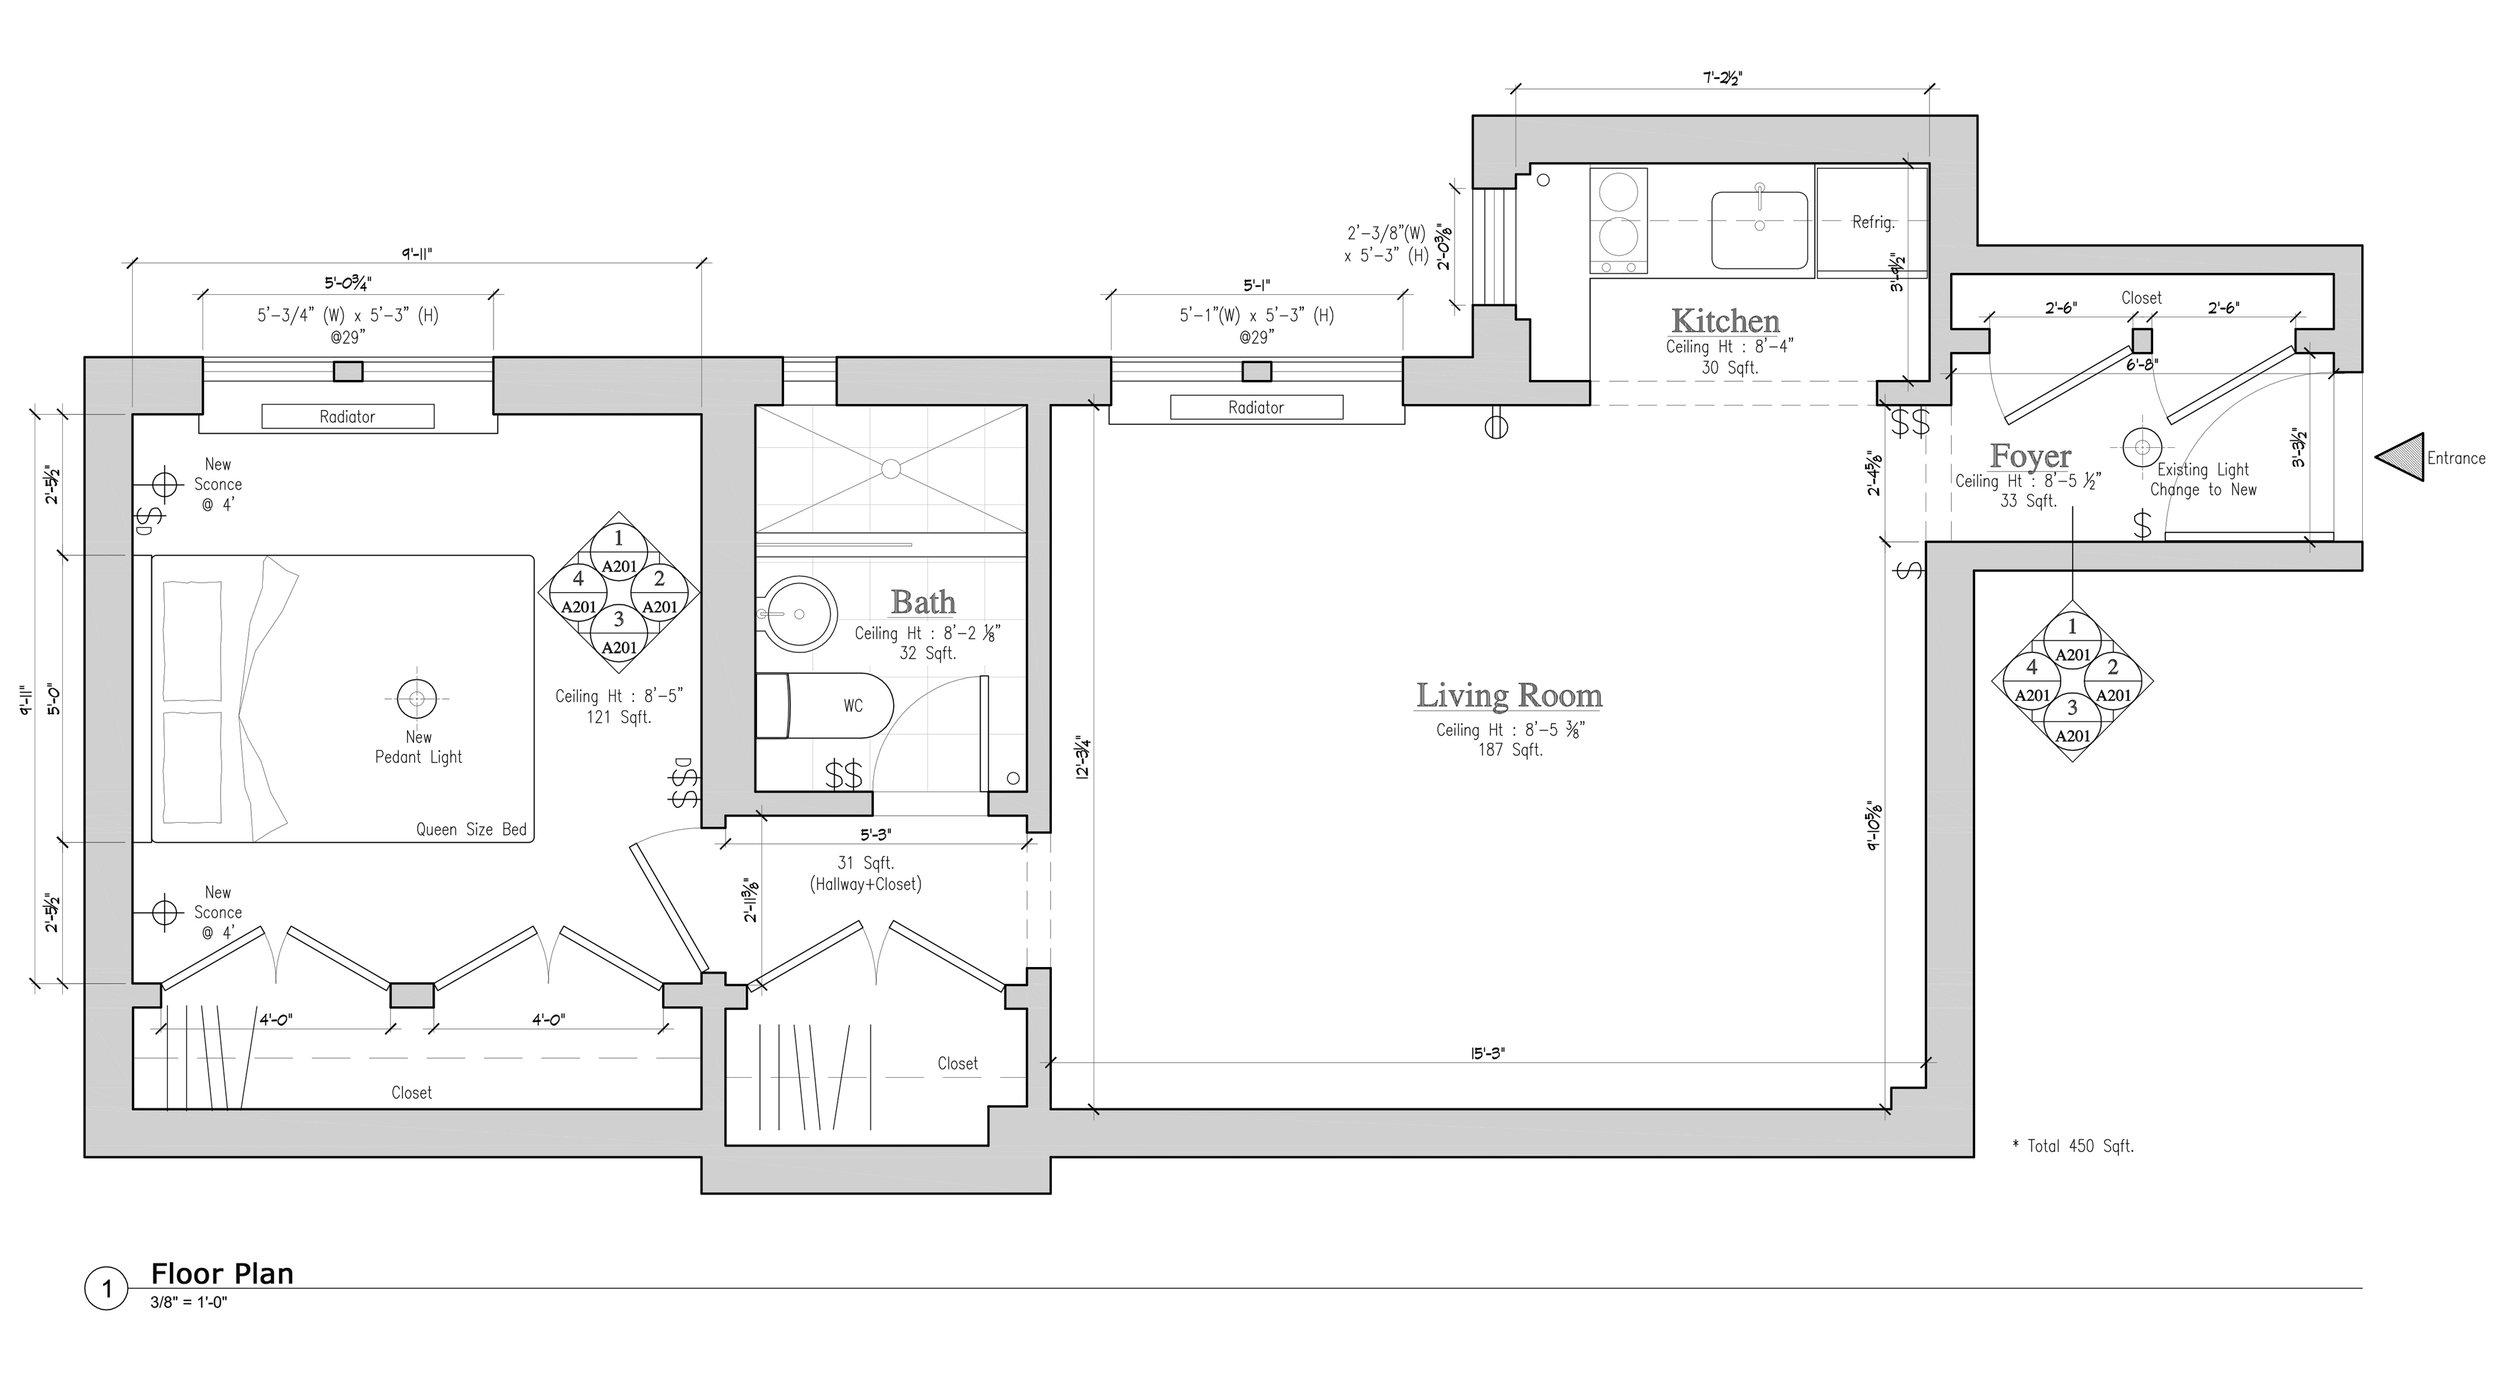 INTERIOR DESIGN: ONE BEDROOM EFFICIENCY RESIDENCE